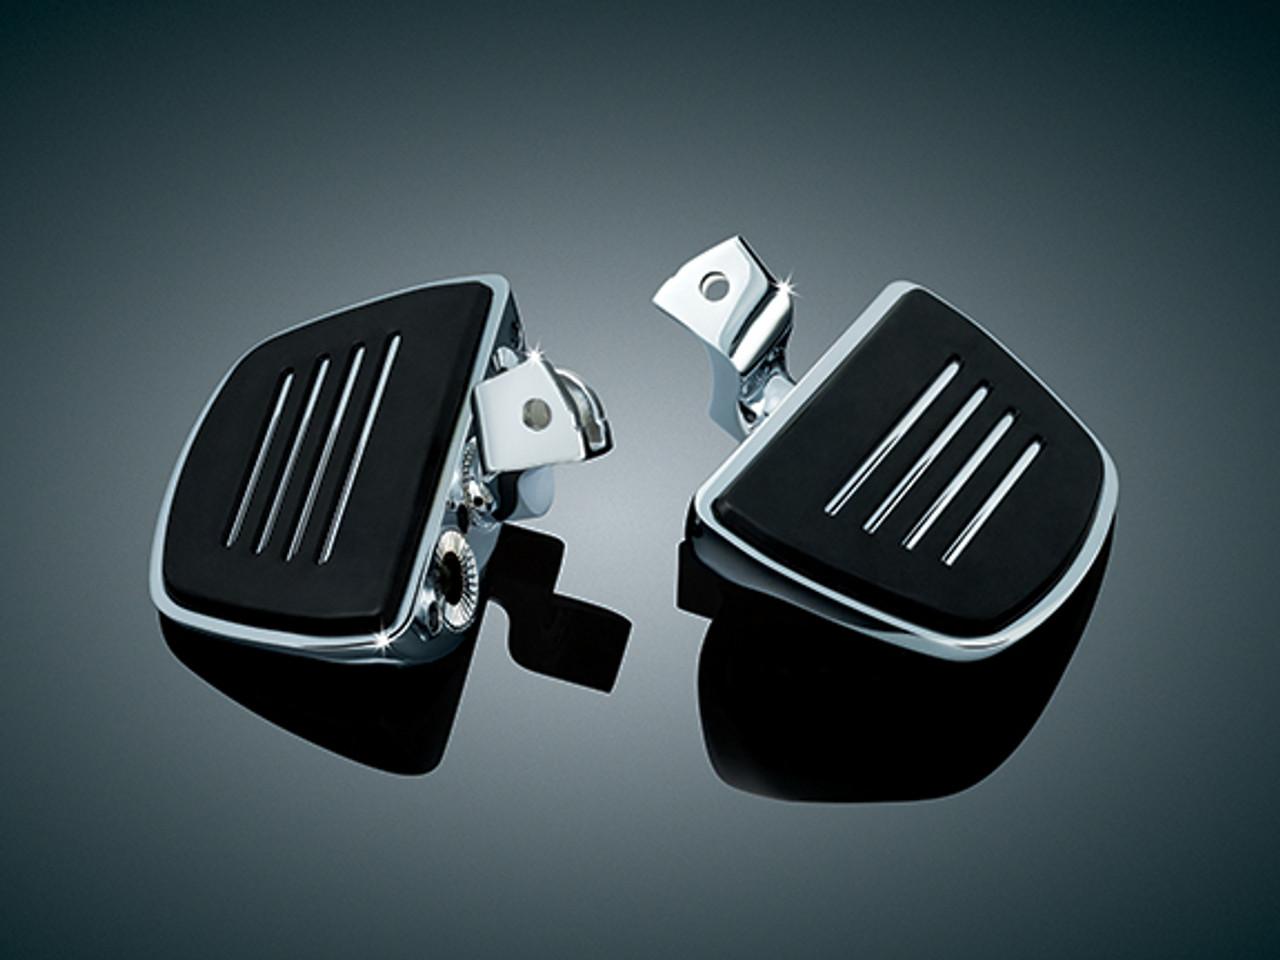 2008-2009 Pontiac G8 GT GXP OEM Front LH RH Sides Curtain Airbag Pair OEM 1C14